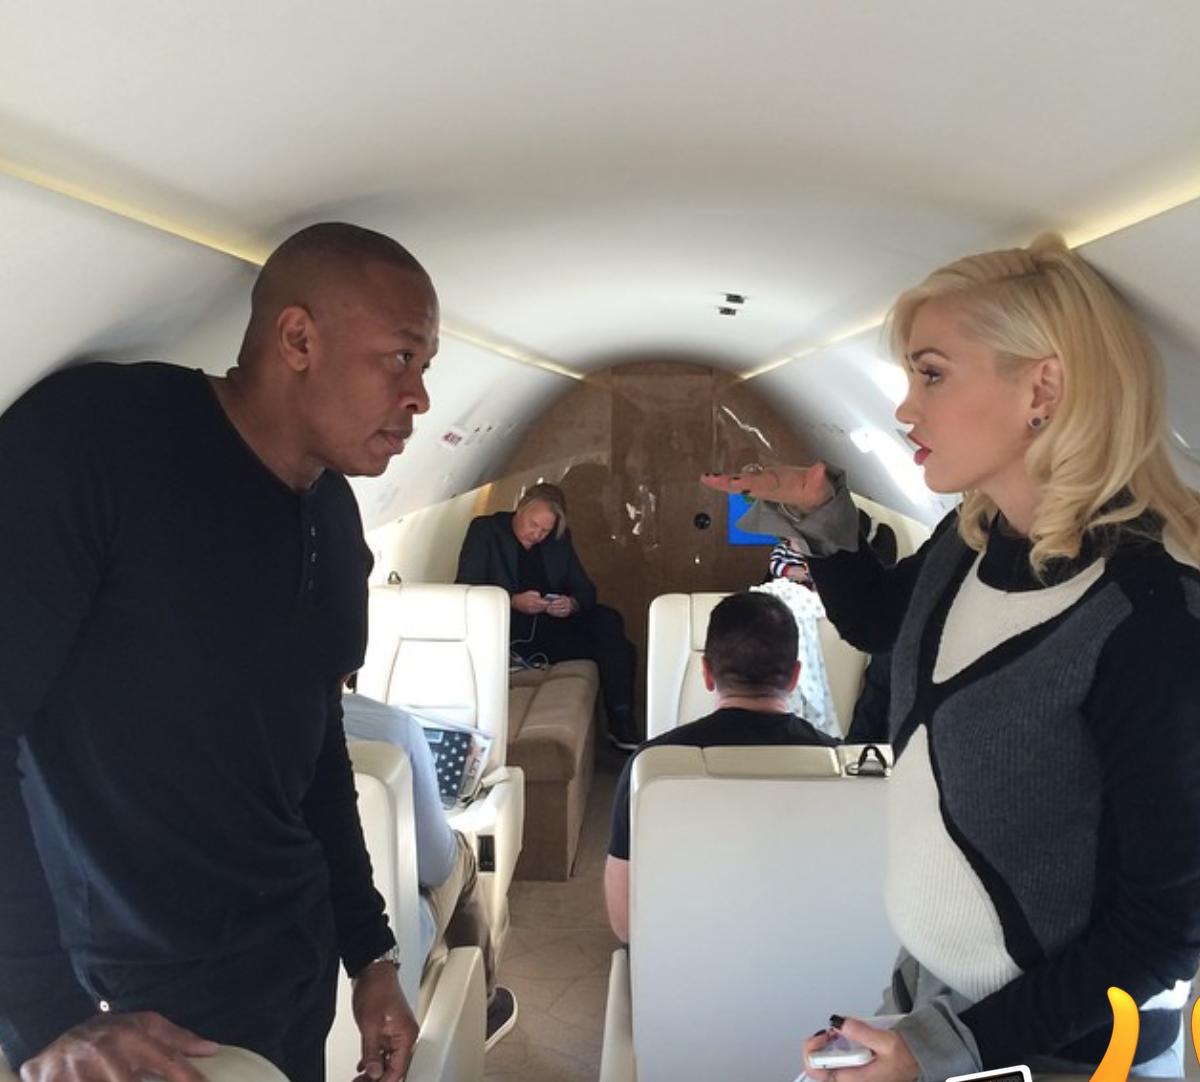 Gwen Stefani, Dr. Dre headed to Apple event